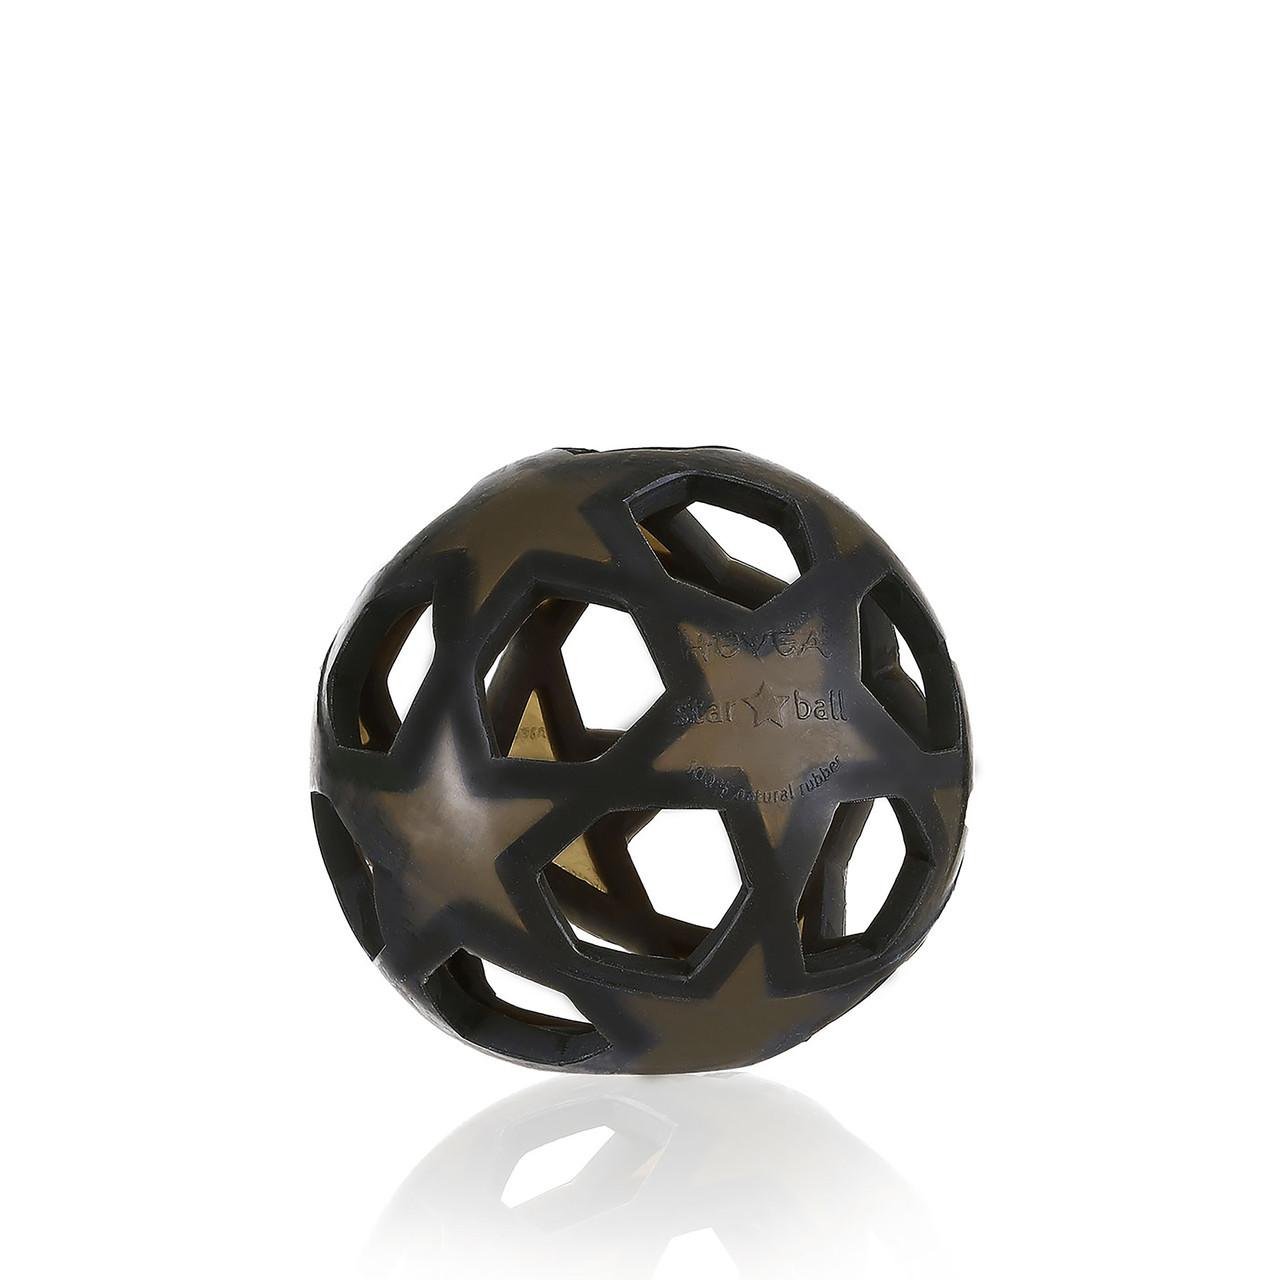 Прорезыватель  Hevea star ball black